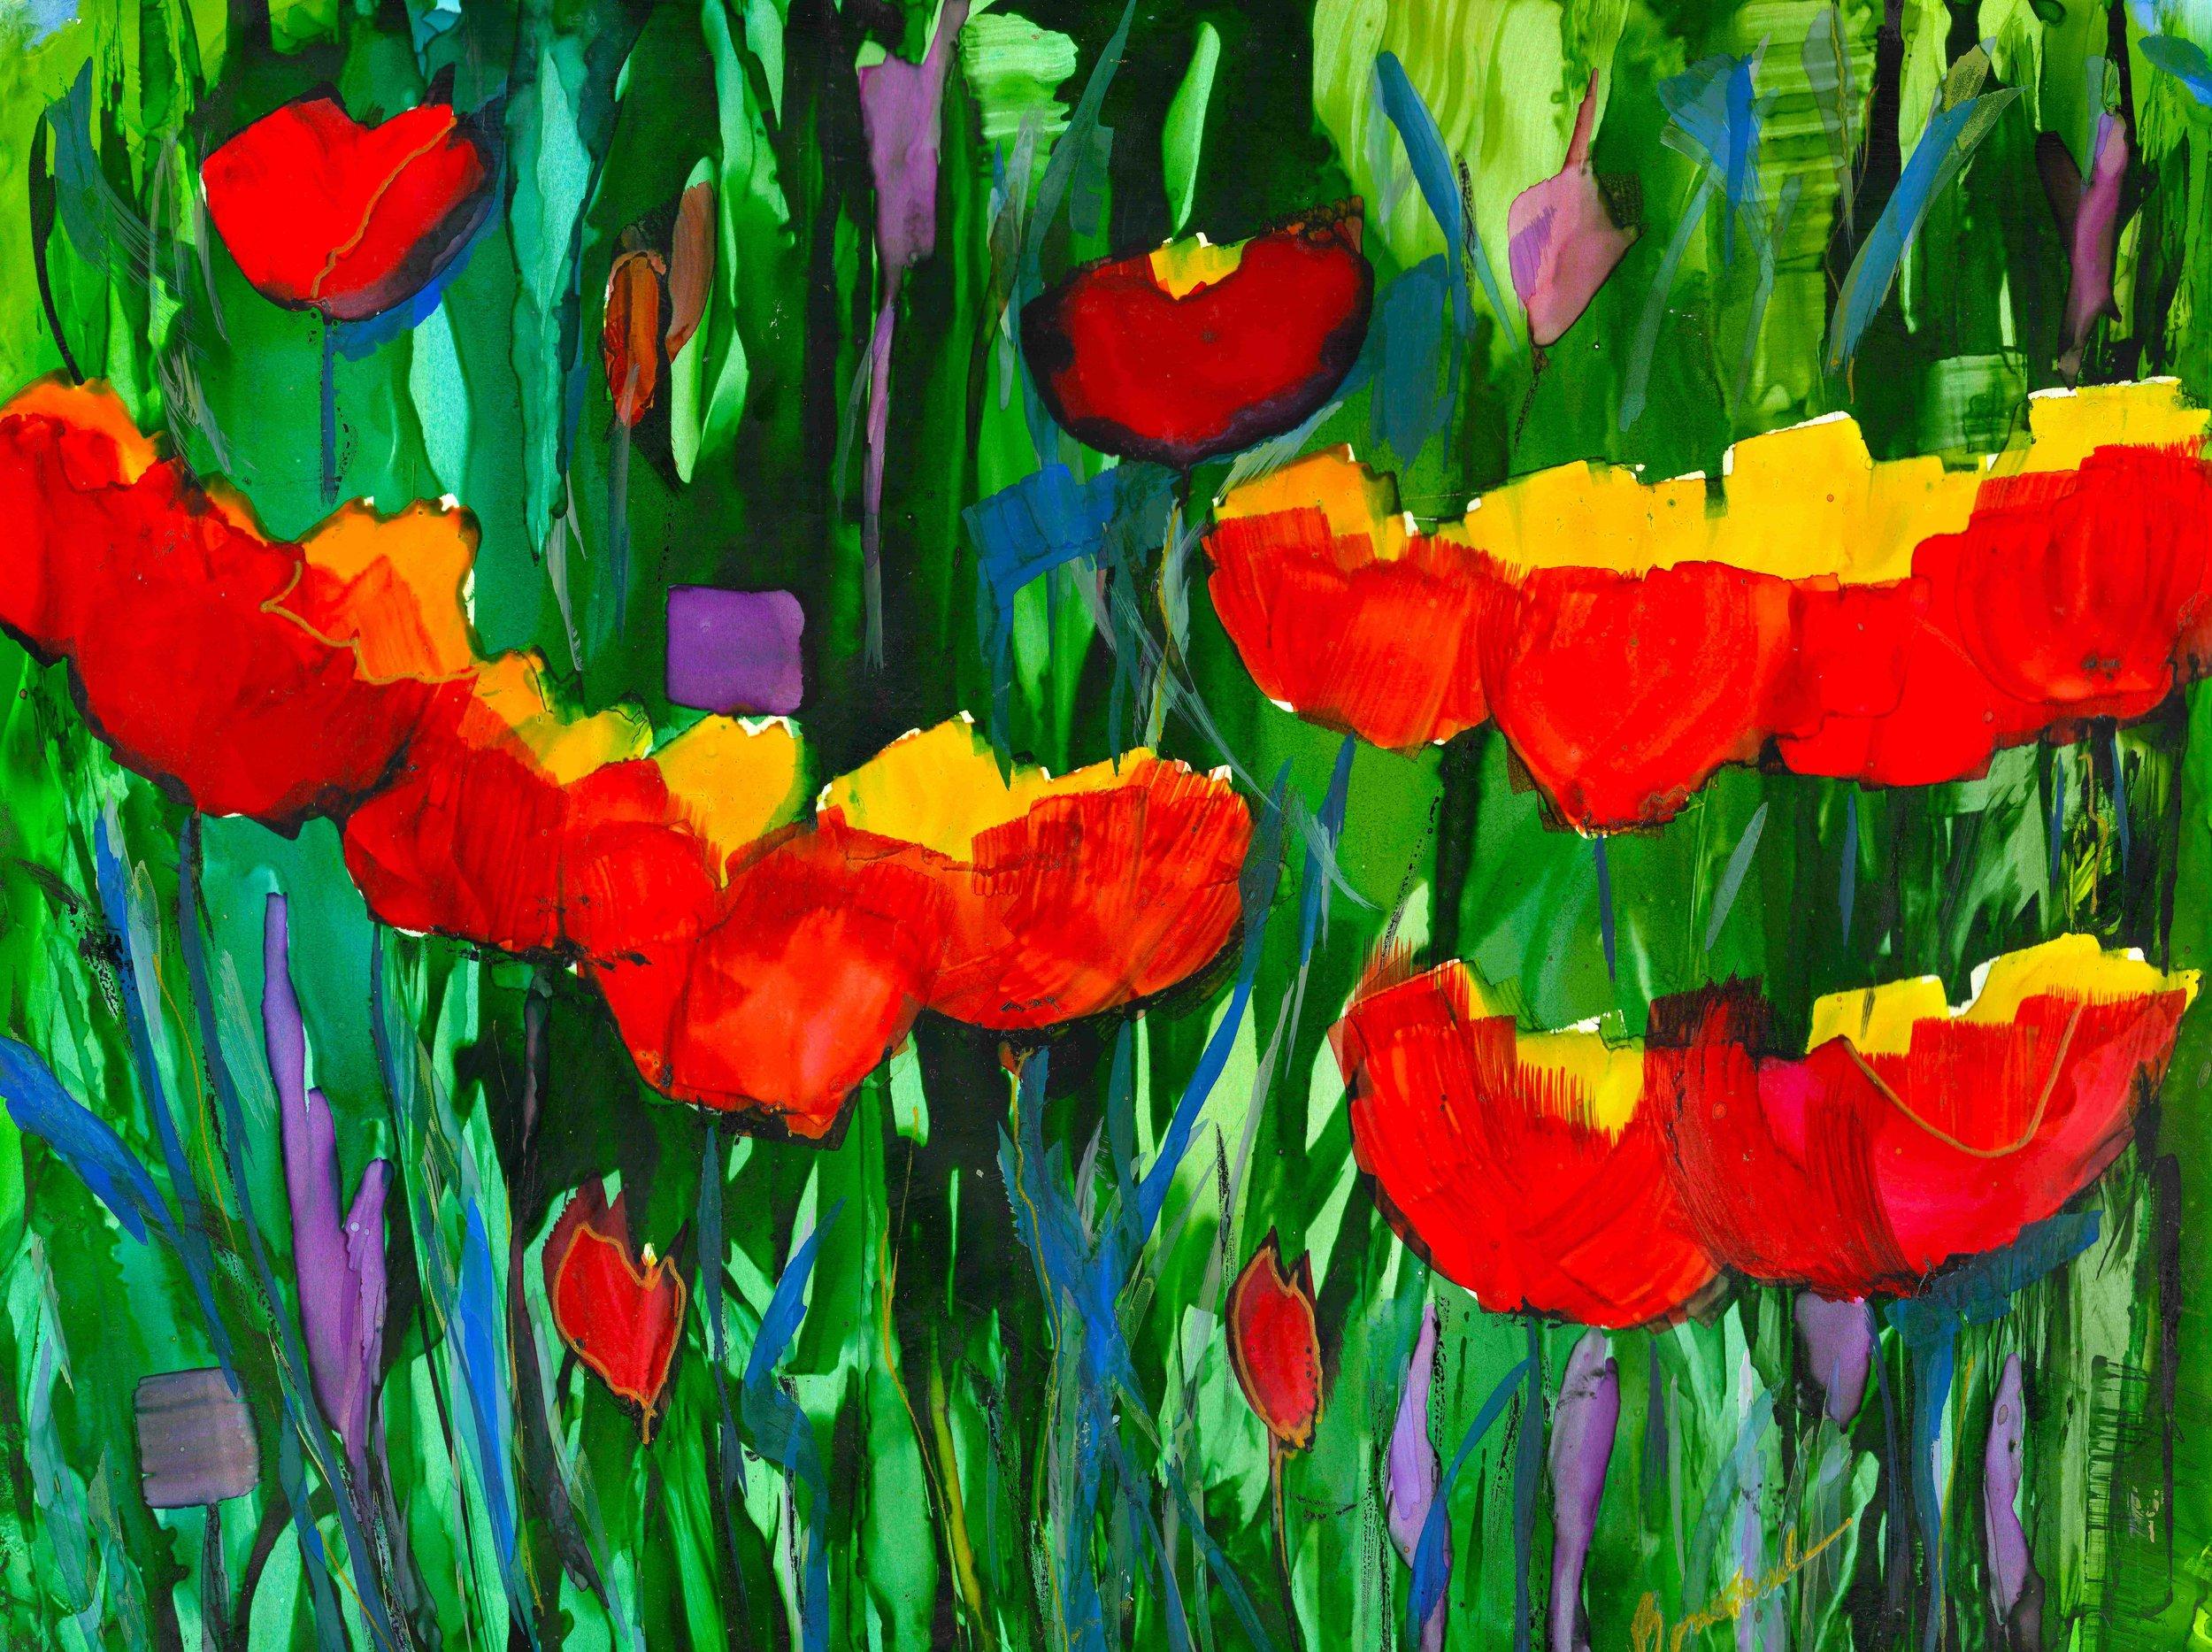 Abstract Tulip Garden.jpg